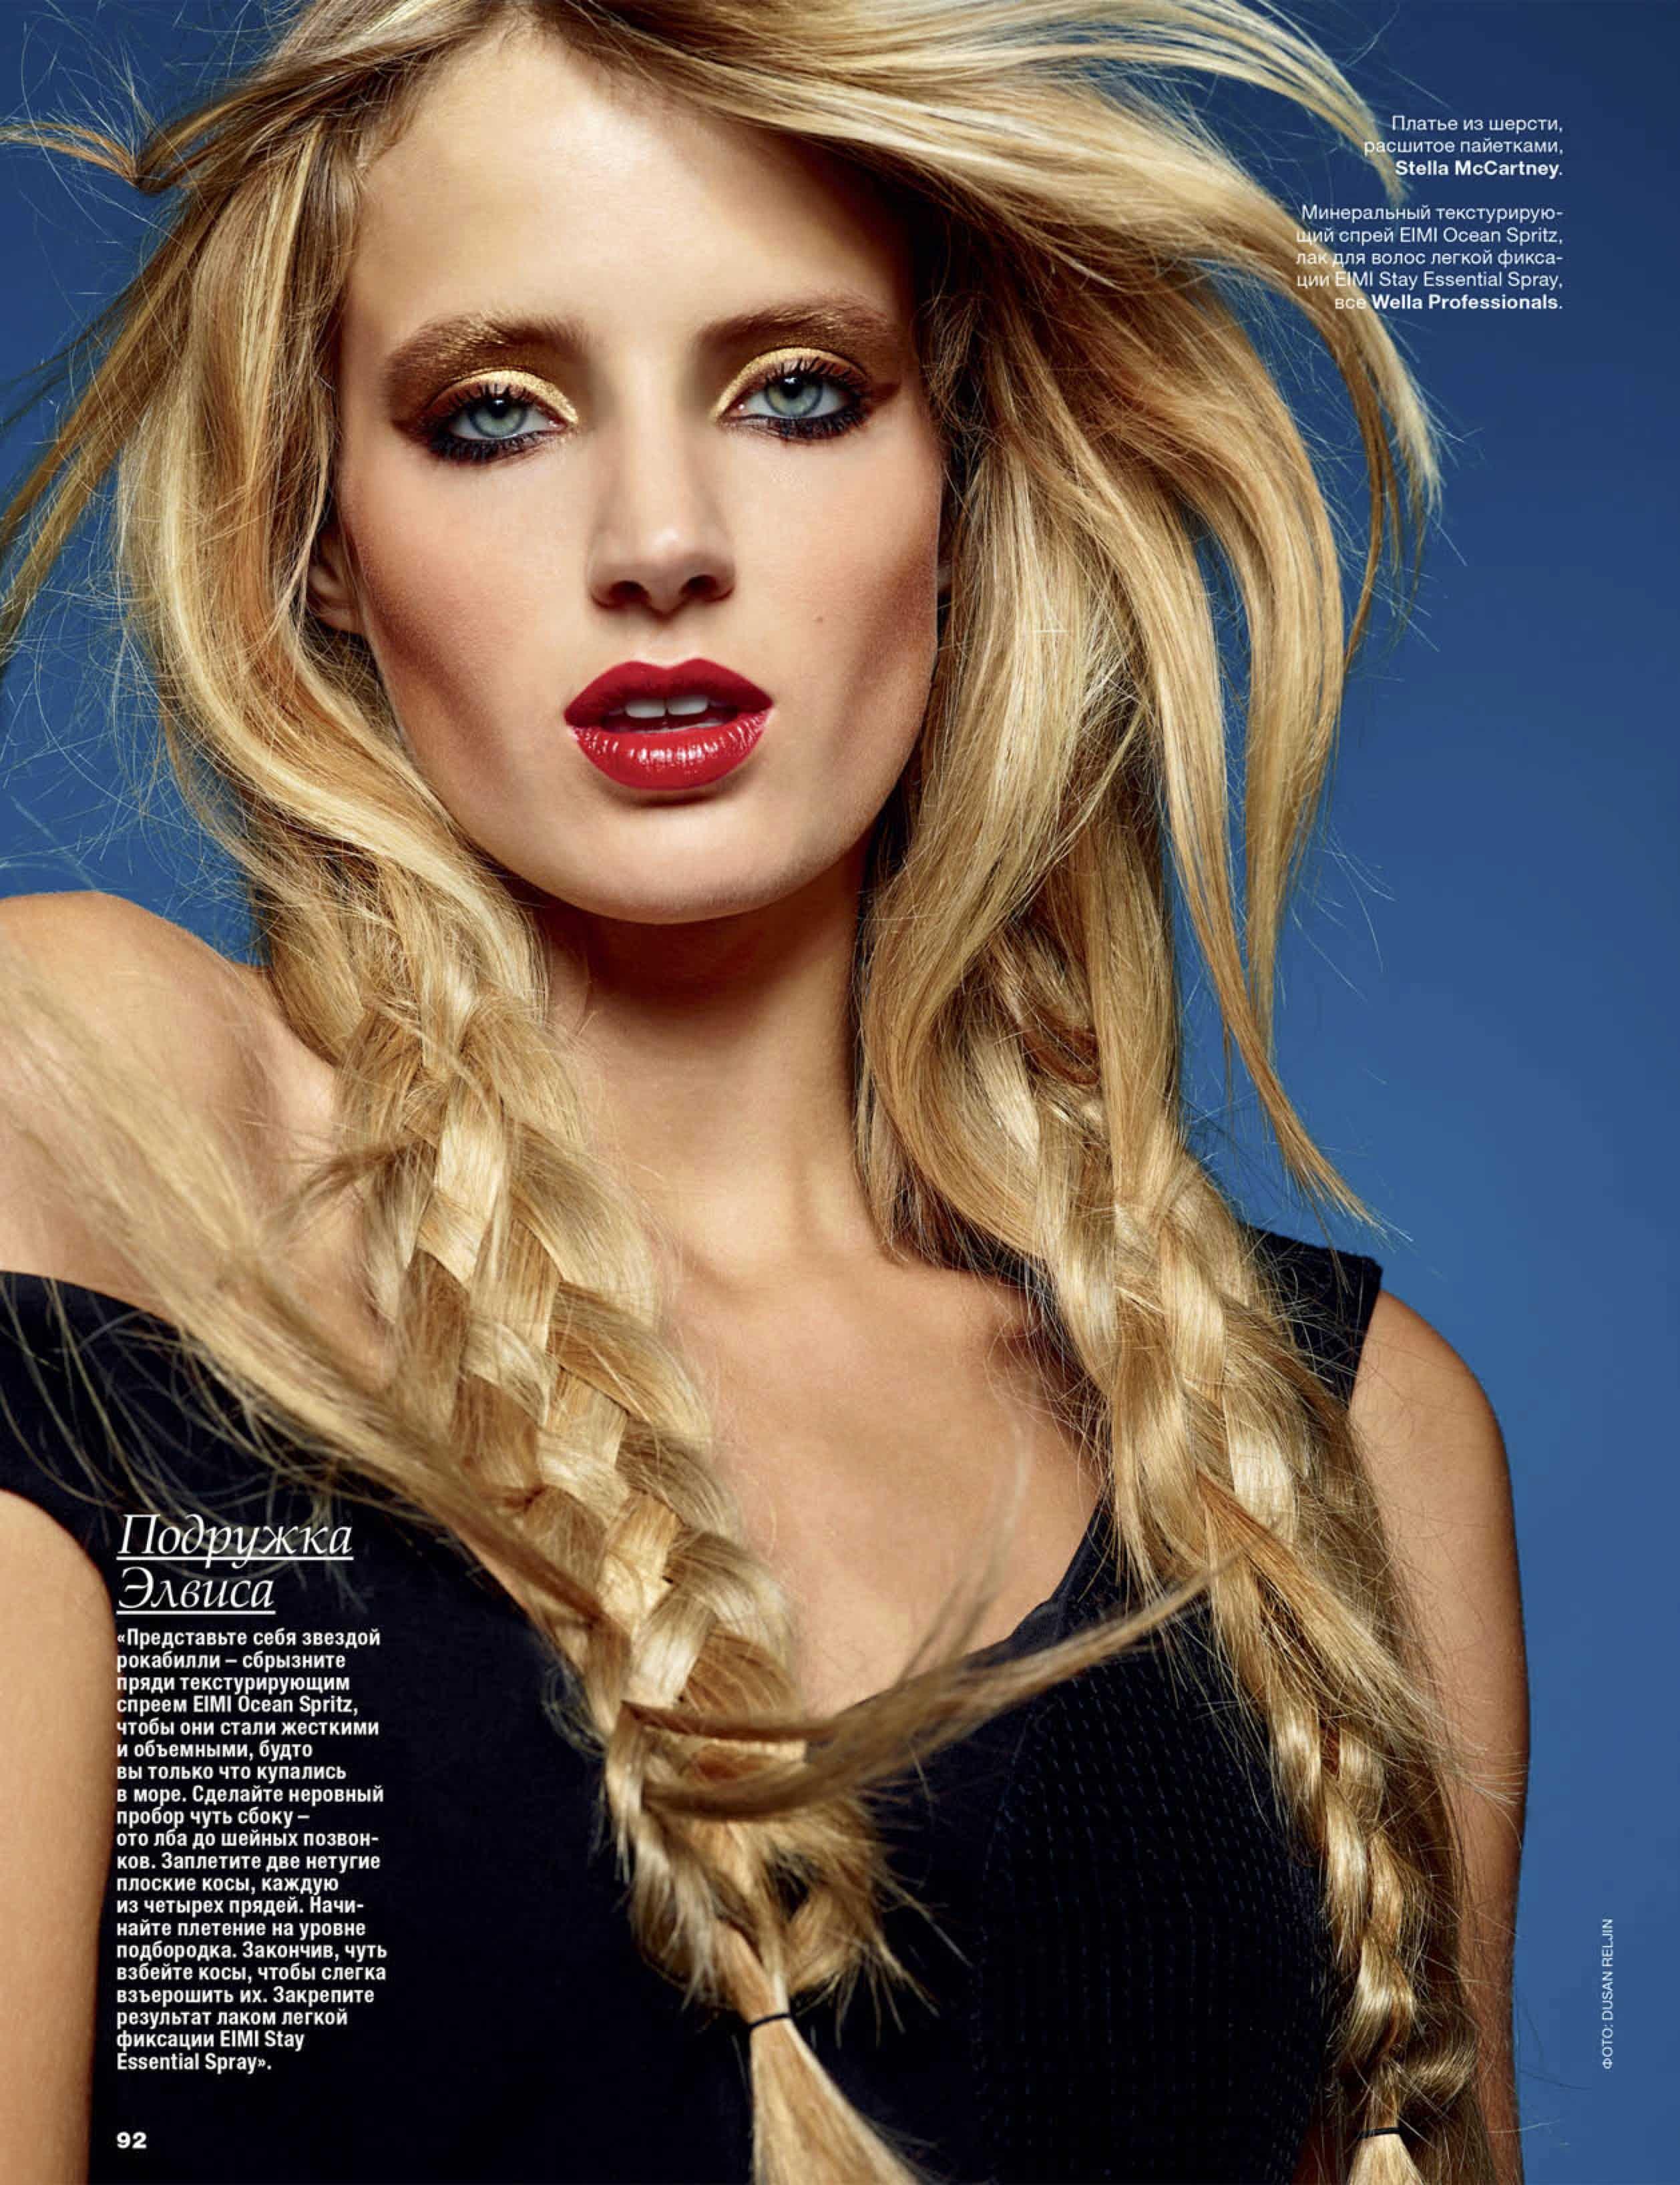 ALLURE RUSSIA - 2015 Photographer: Dusan Reljin Model: Fanny Francois Location: London - UK